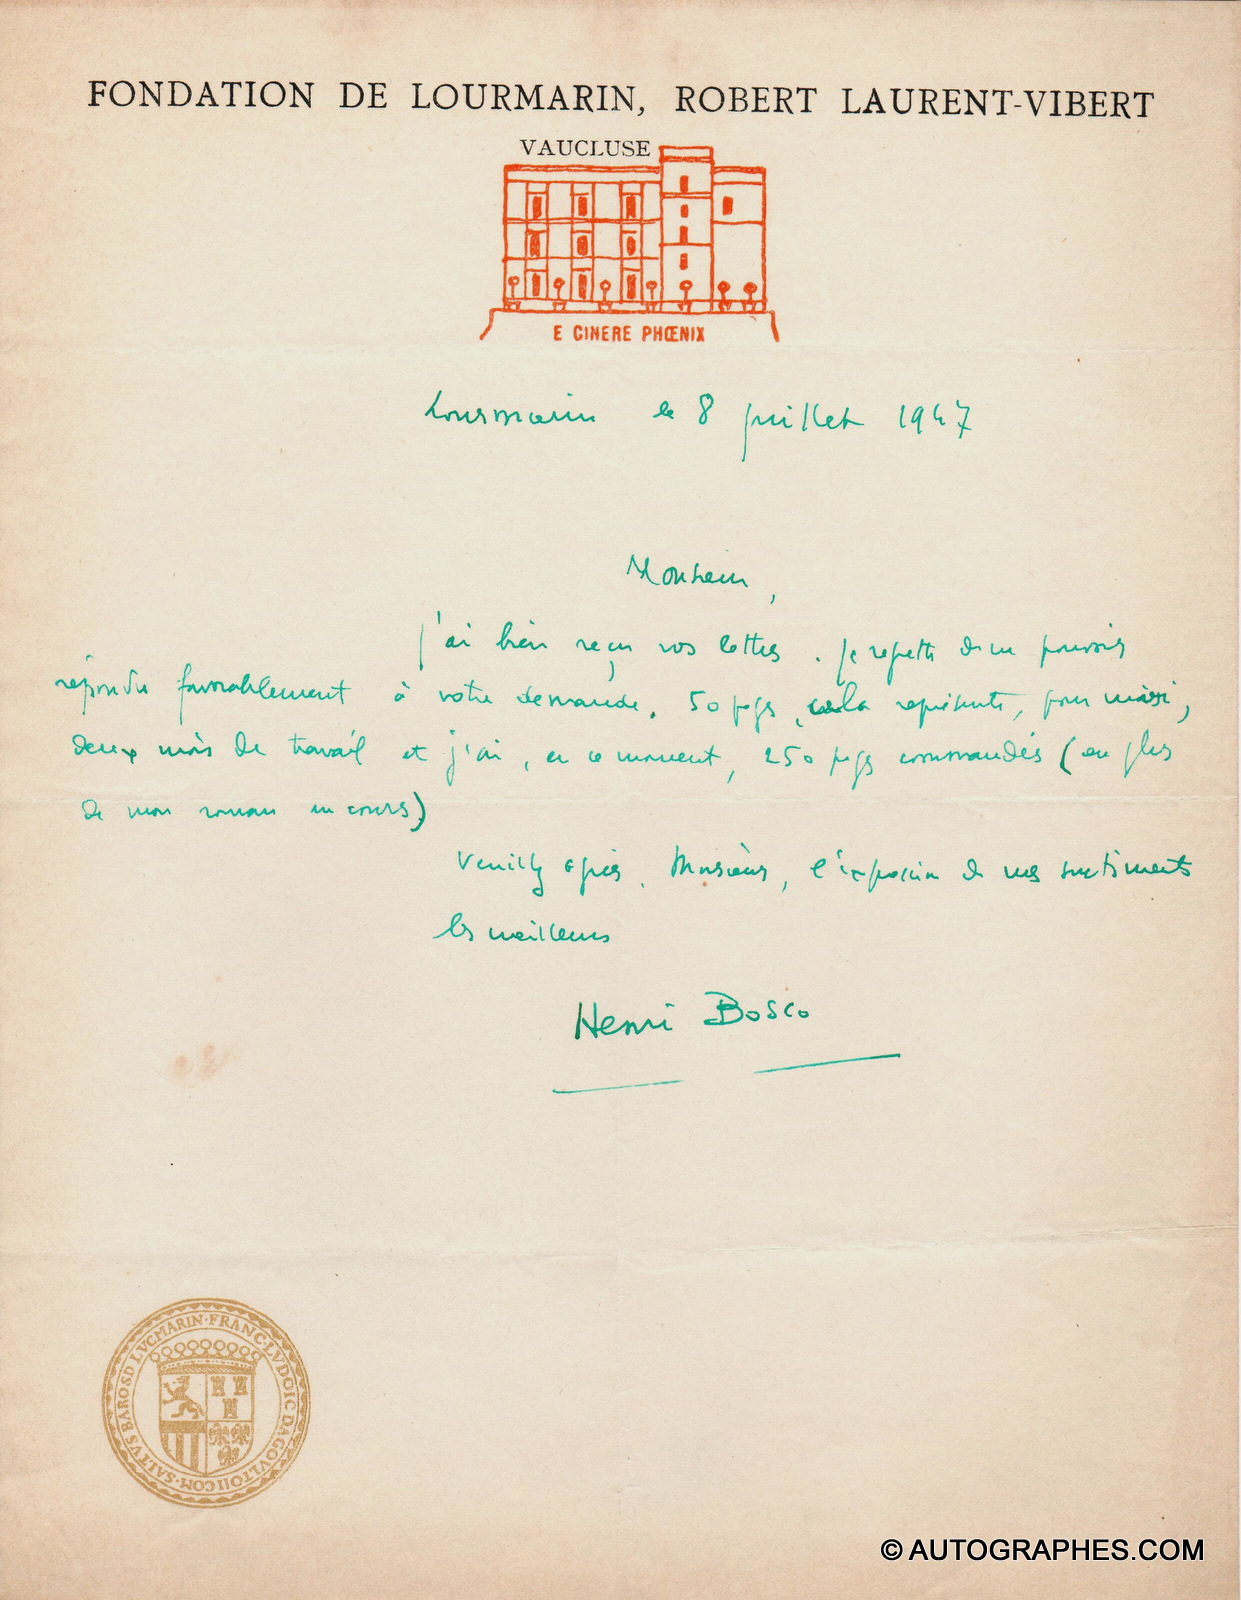 Henri BOSCO - Lettre autographe signée (Lourmarin 8 juillet 1947)